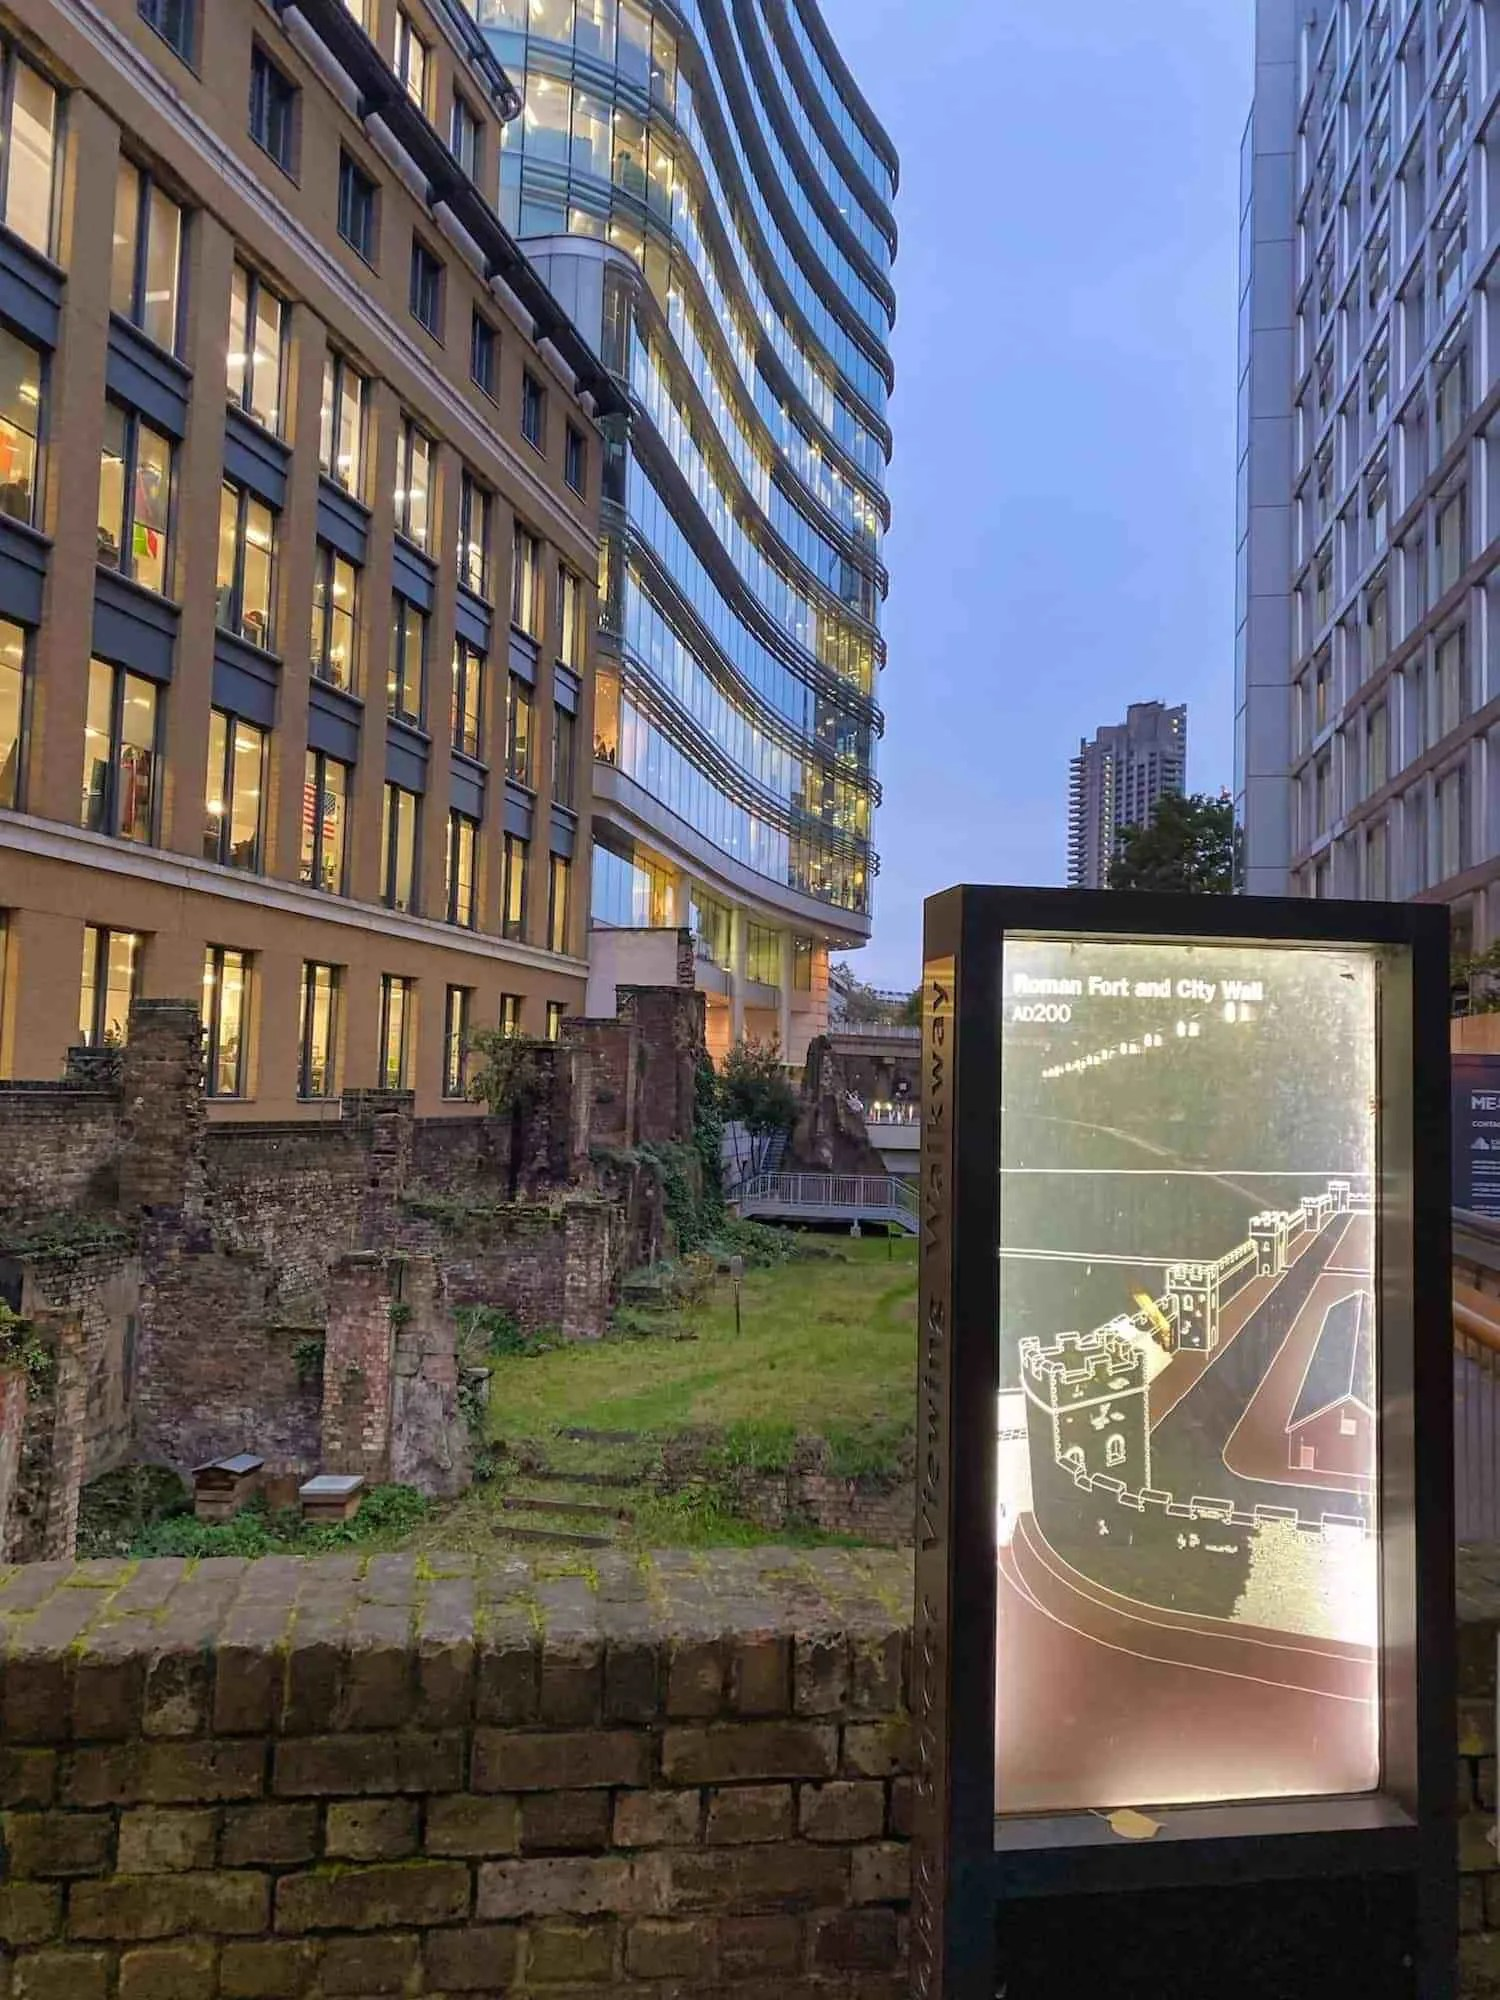 London Wall Walk - Plaque 20